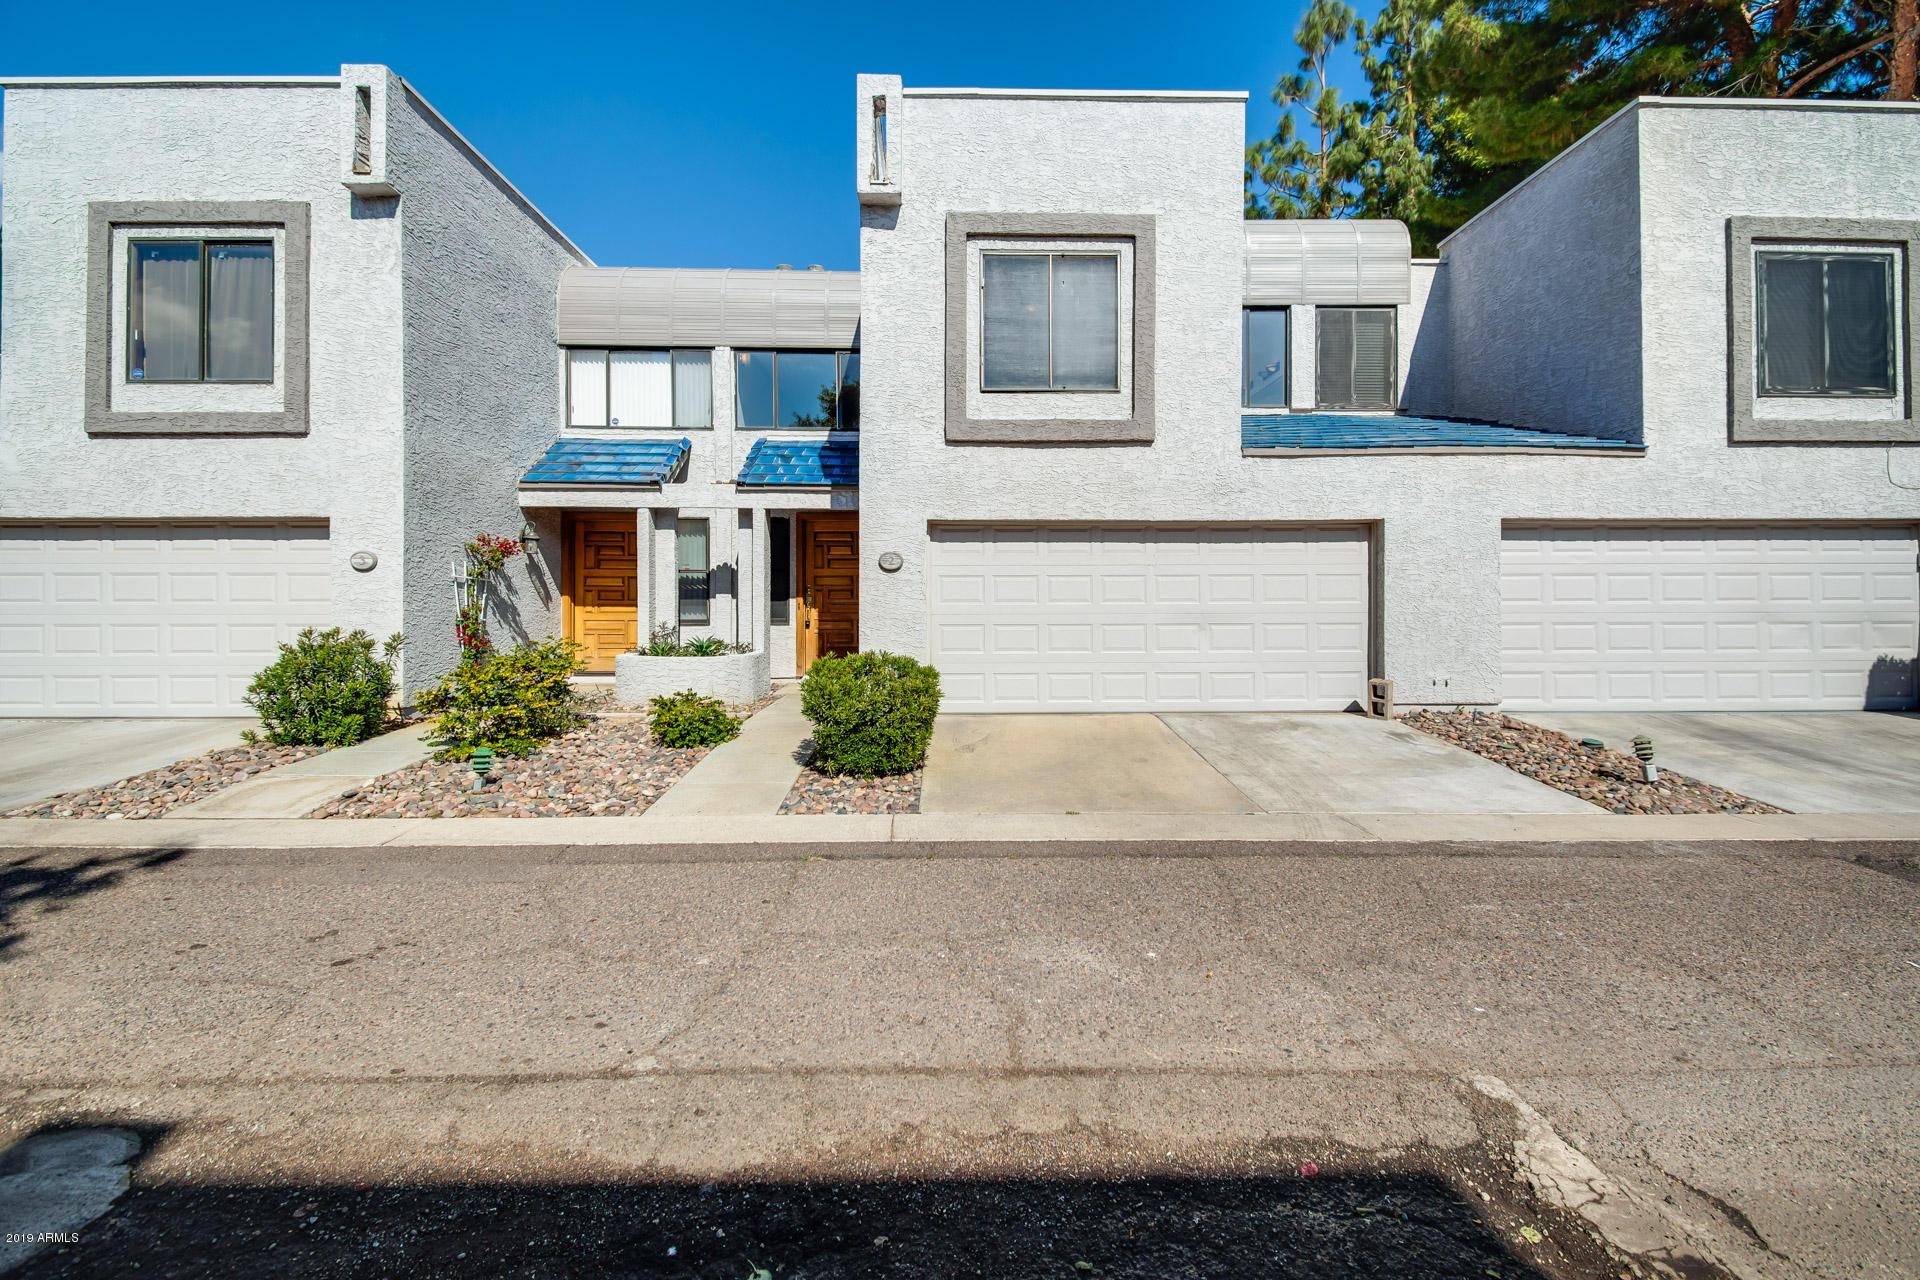 Photo of 5750 N 10TH Street #2, Phoenix, AZ 85014